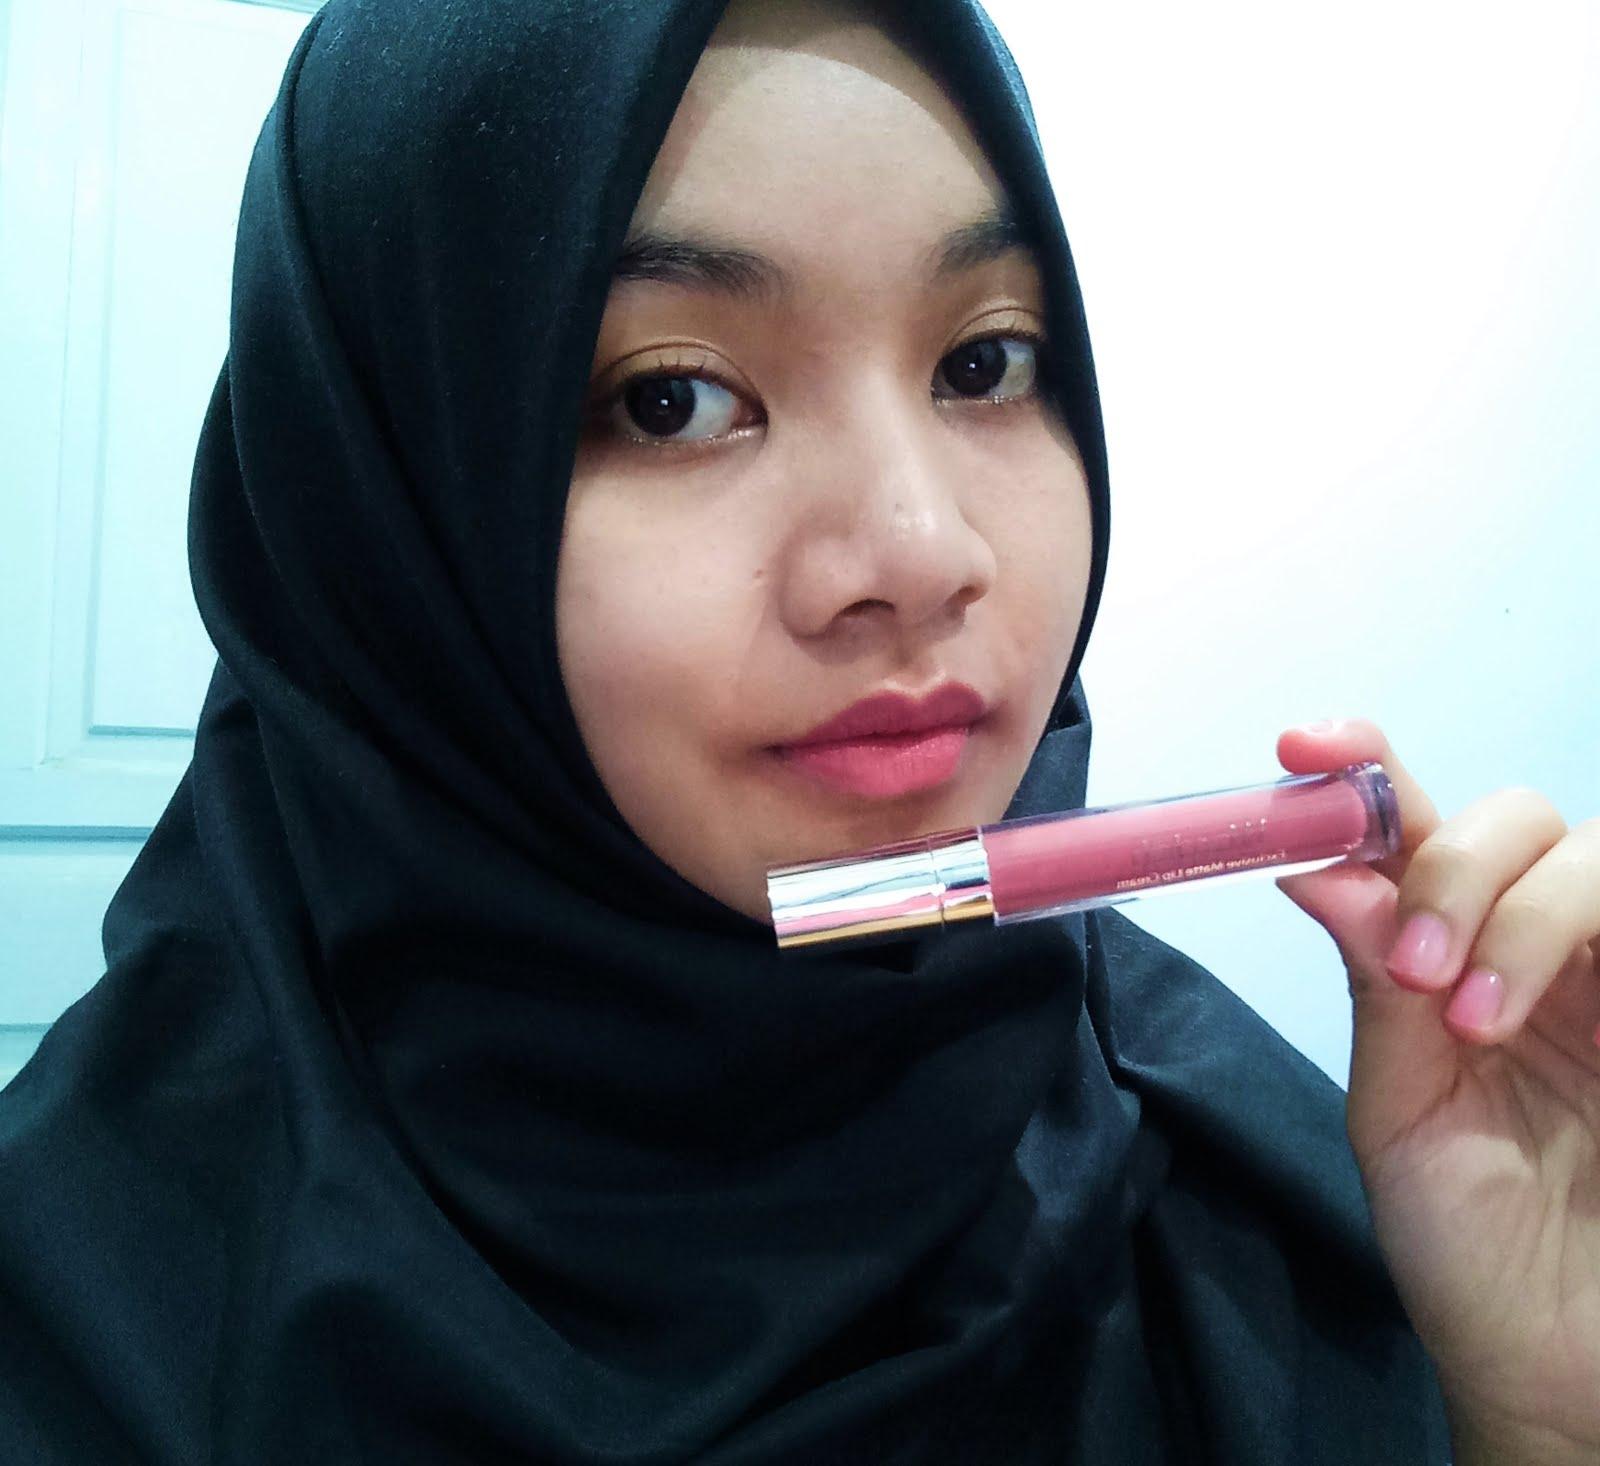 Review Lip Cream Wardah Vs Emina Make Over Scenes From The Matte Lipstik Lipcream 03 Mauvelous Exclusive 09 Mauve On